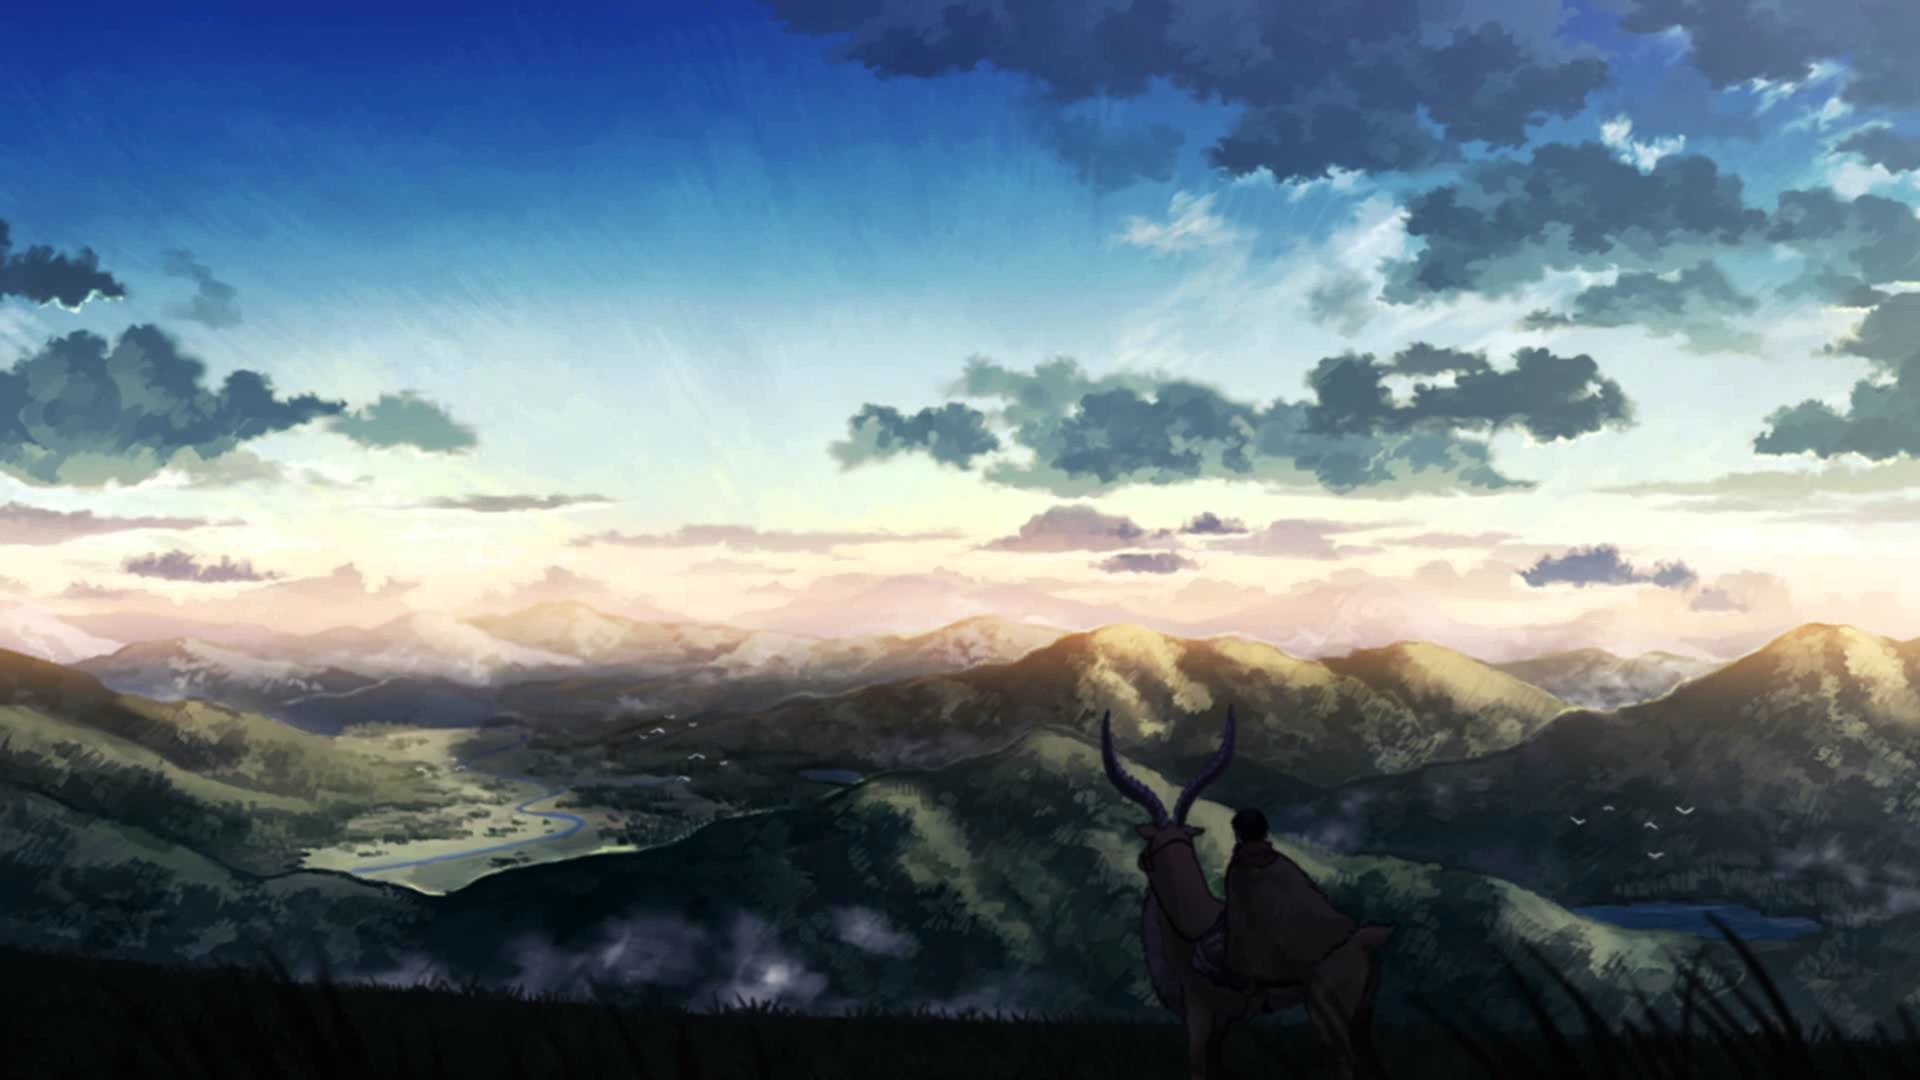 Princess Mononoke Symphonic Suite – Joe Hisaishi – Czech Republic Orchestra